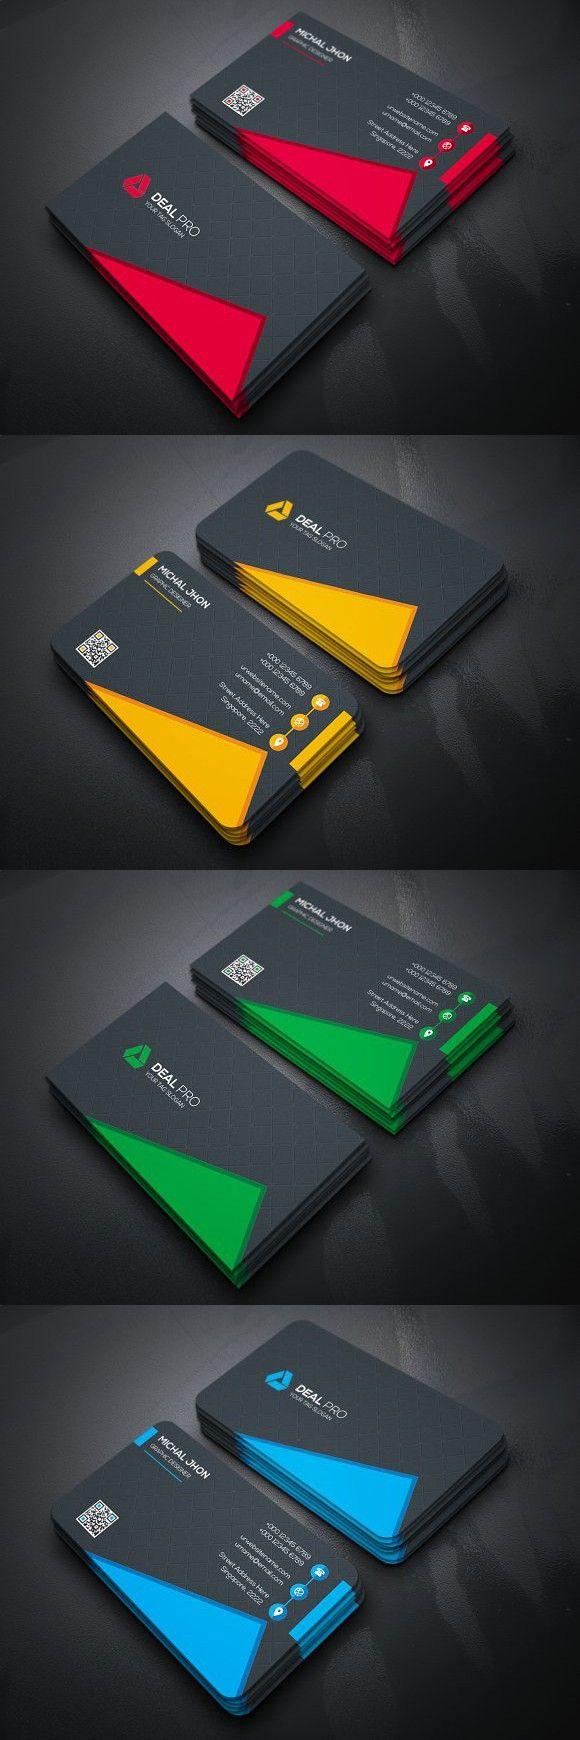 Business Card Business Card Templates Business Card Design Minimal Business Card Design Inspiration Professional Business Card Design